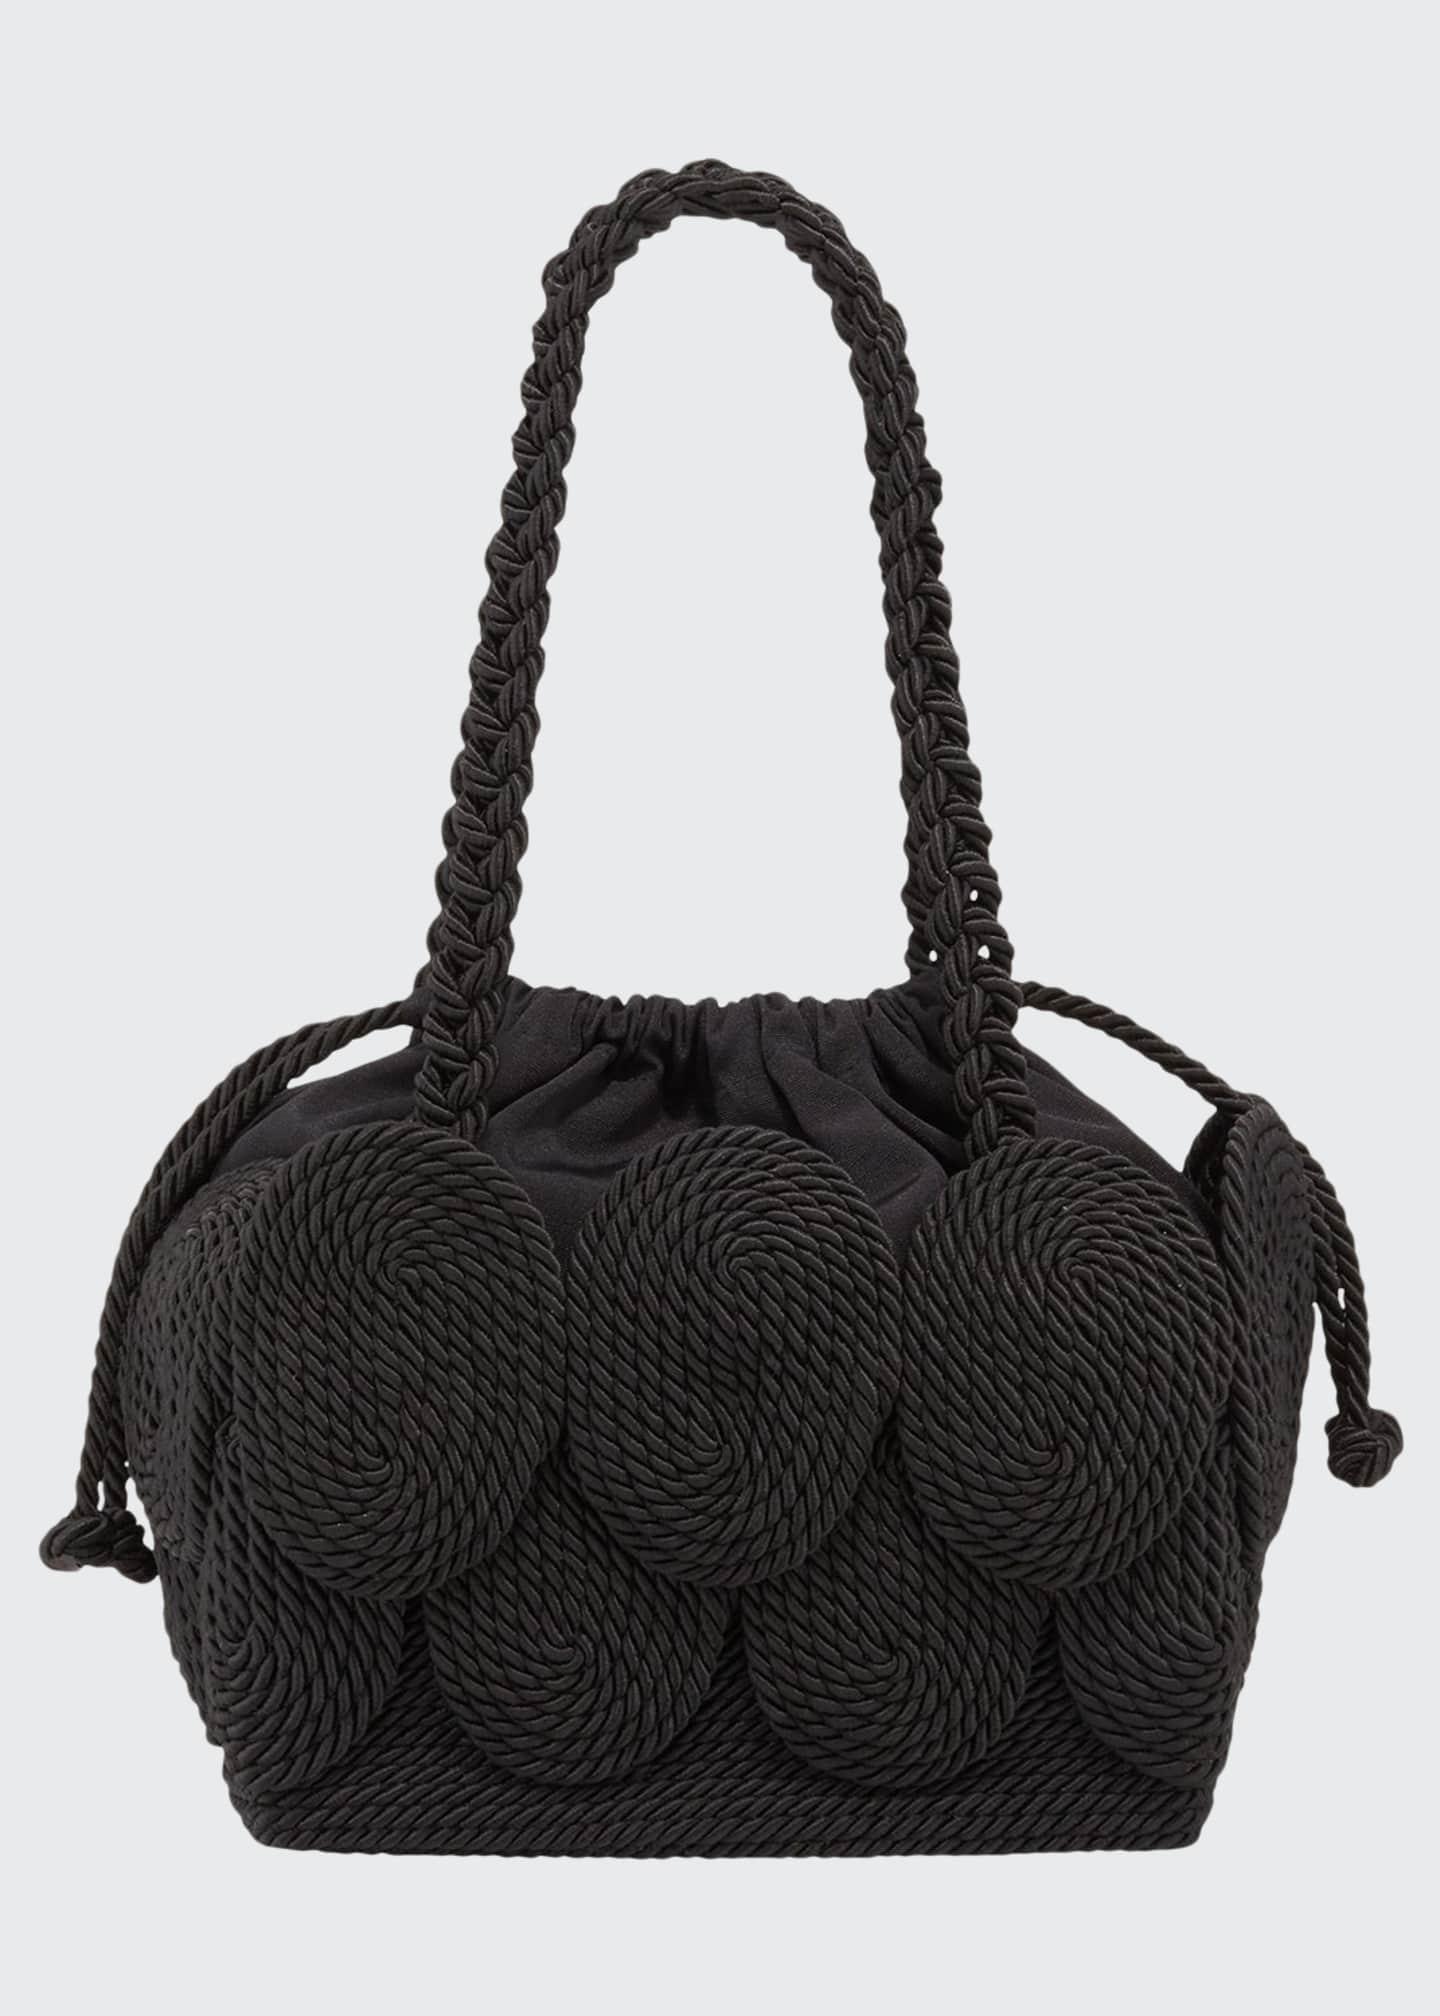 Mehry Mu Cha Cha Rope Square Tote Bag